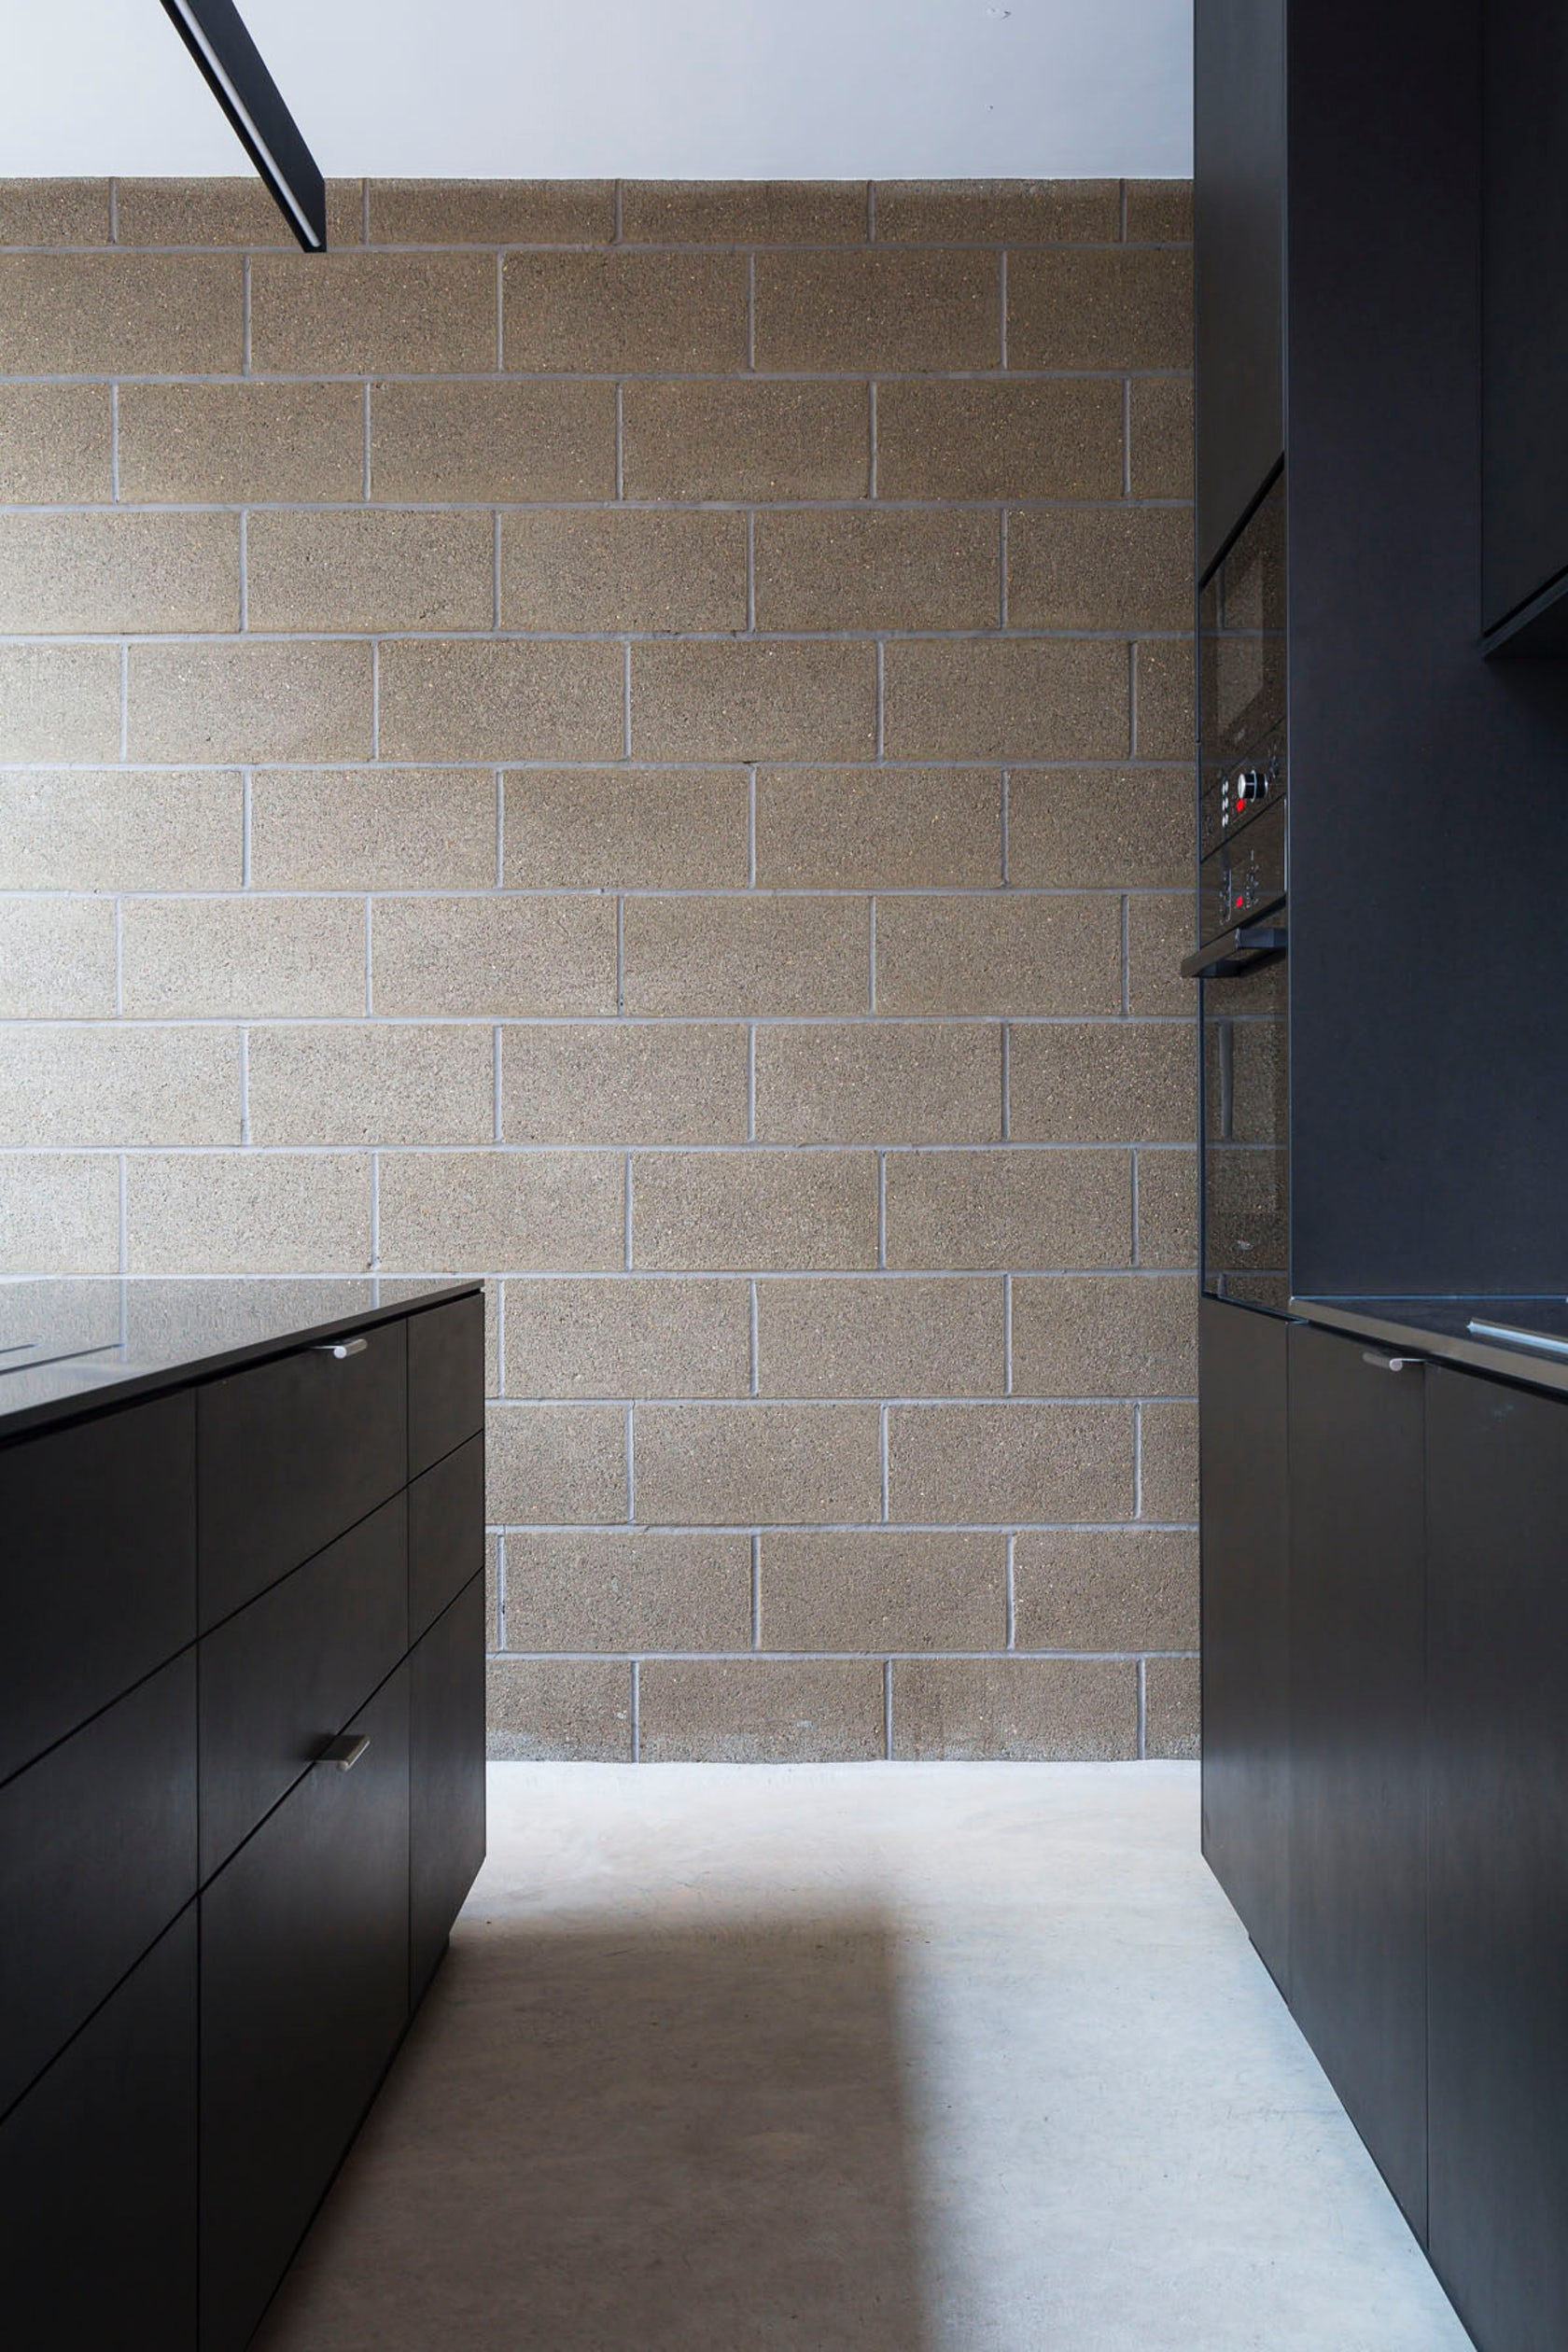 Block house architizer - Interior cinder block wall ideas ...